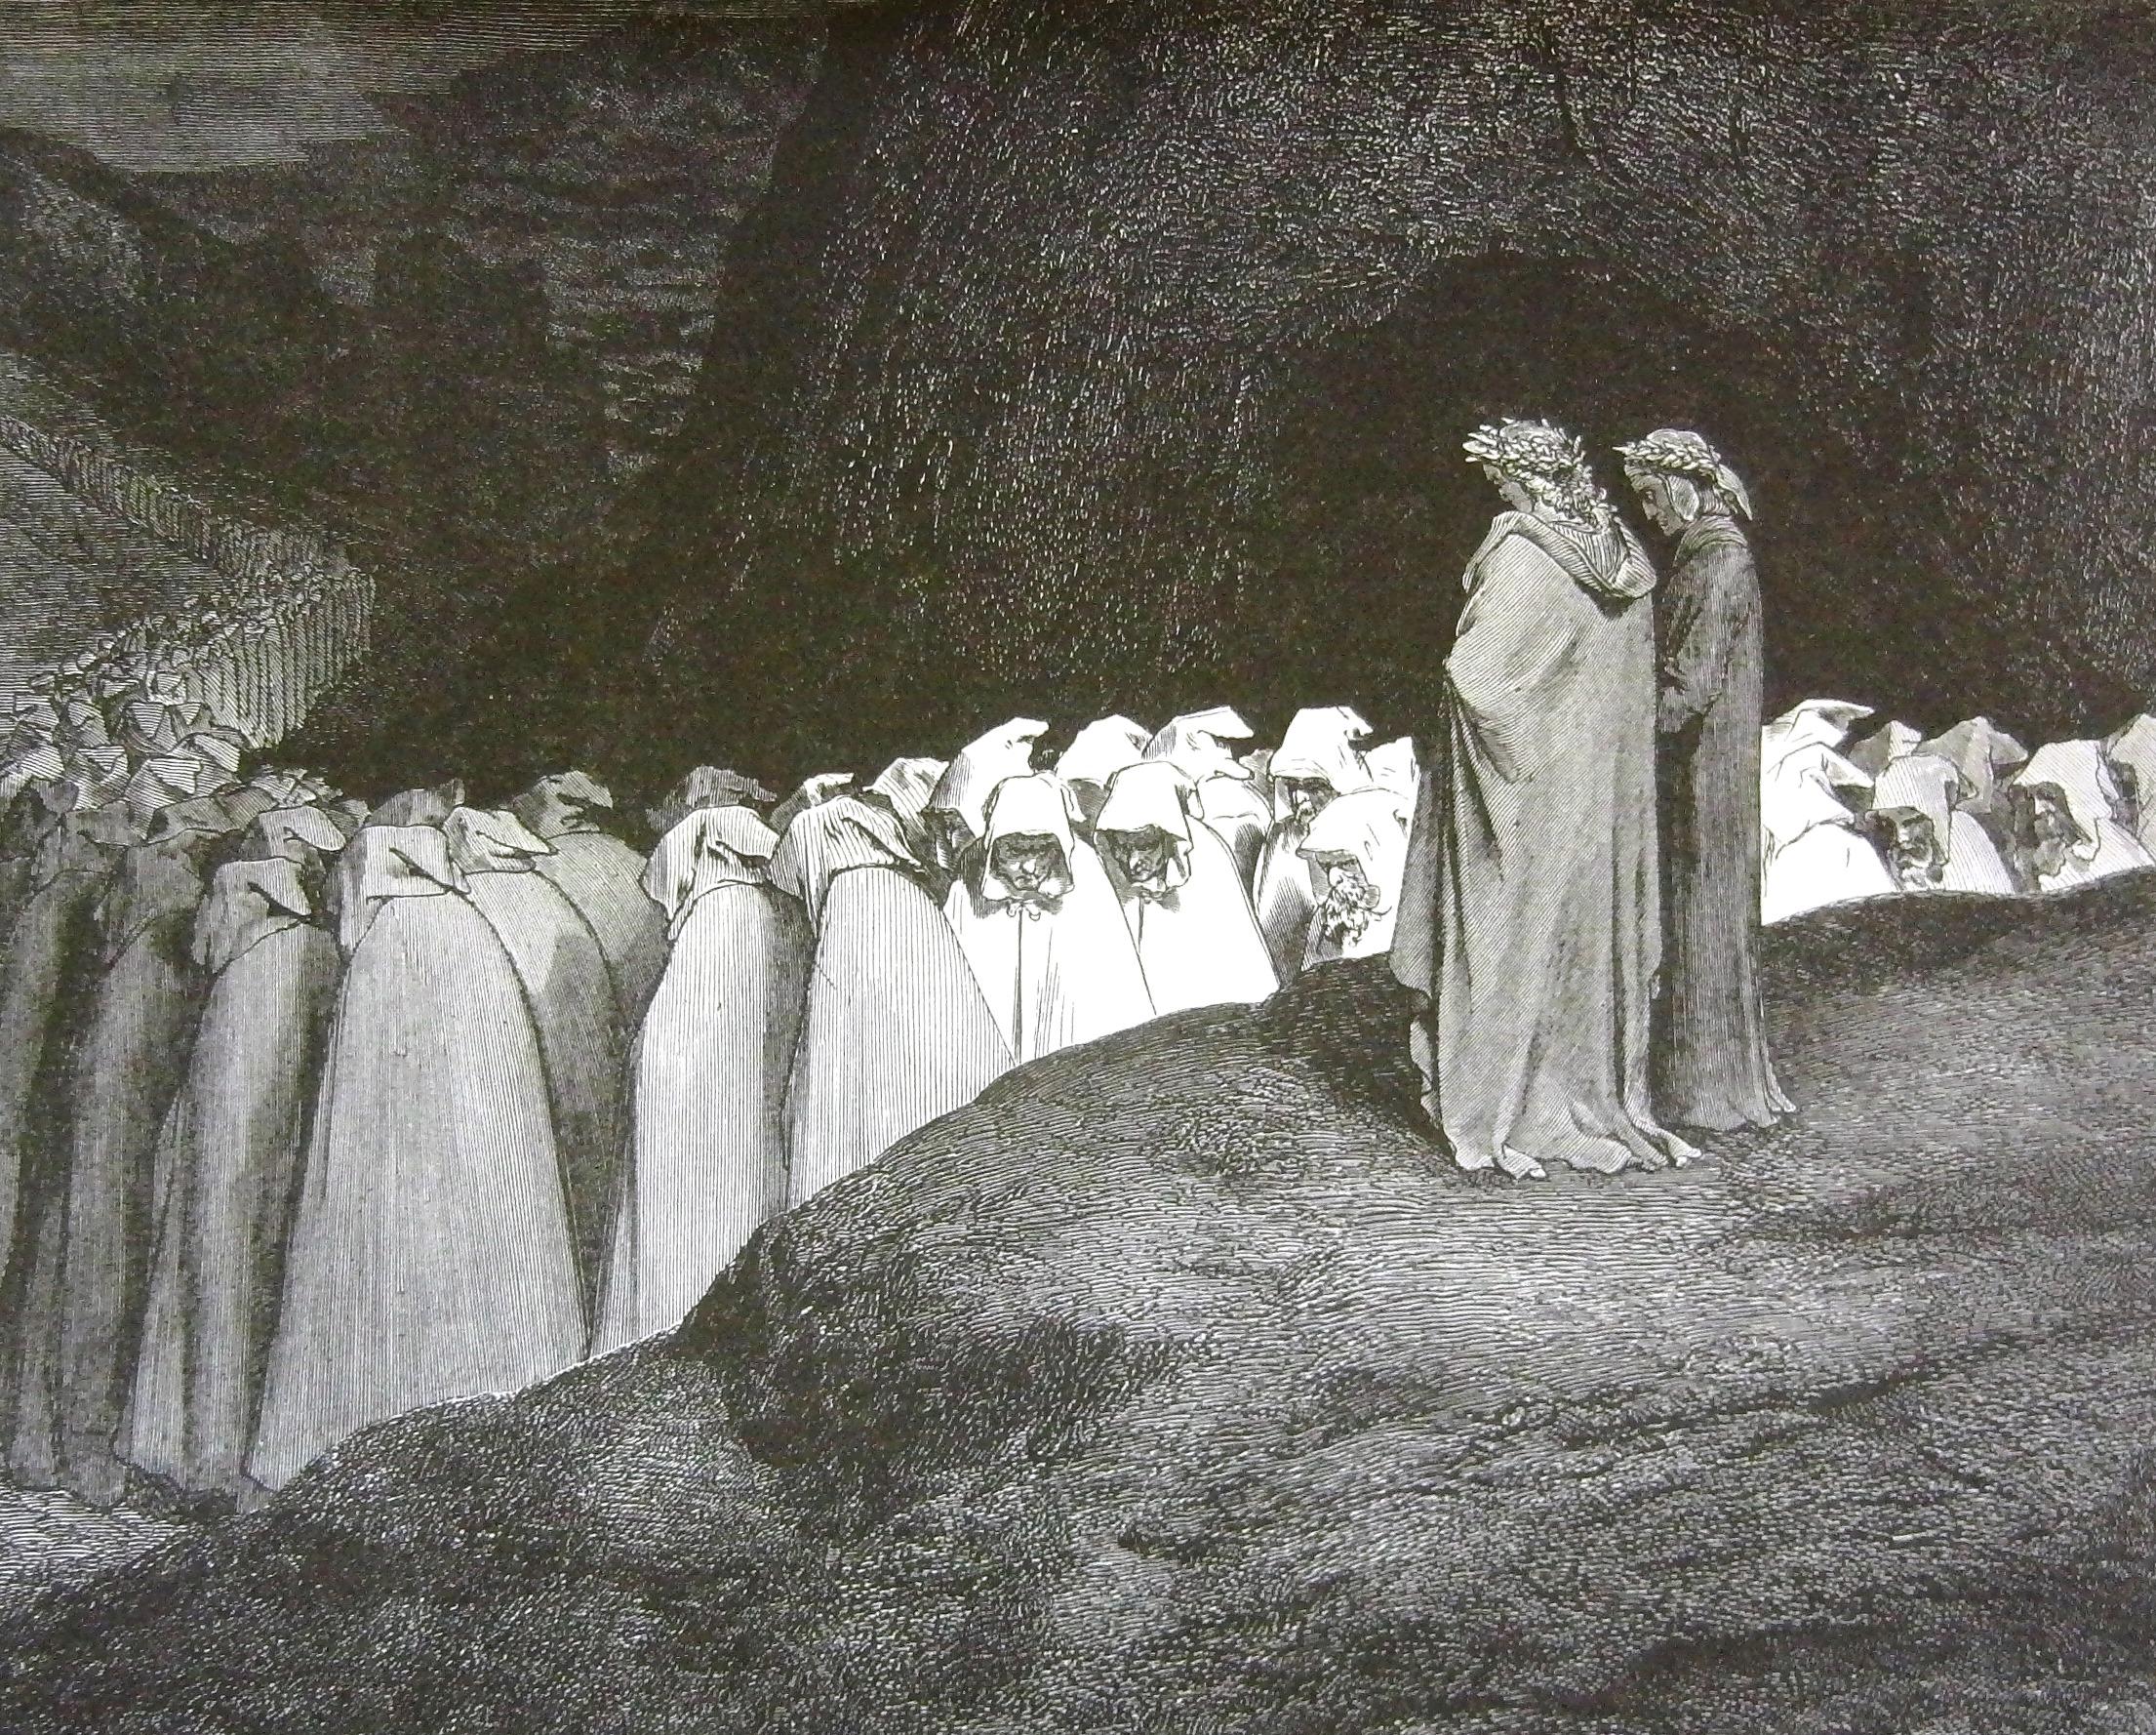 Dante & Virgil see Shades